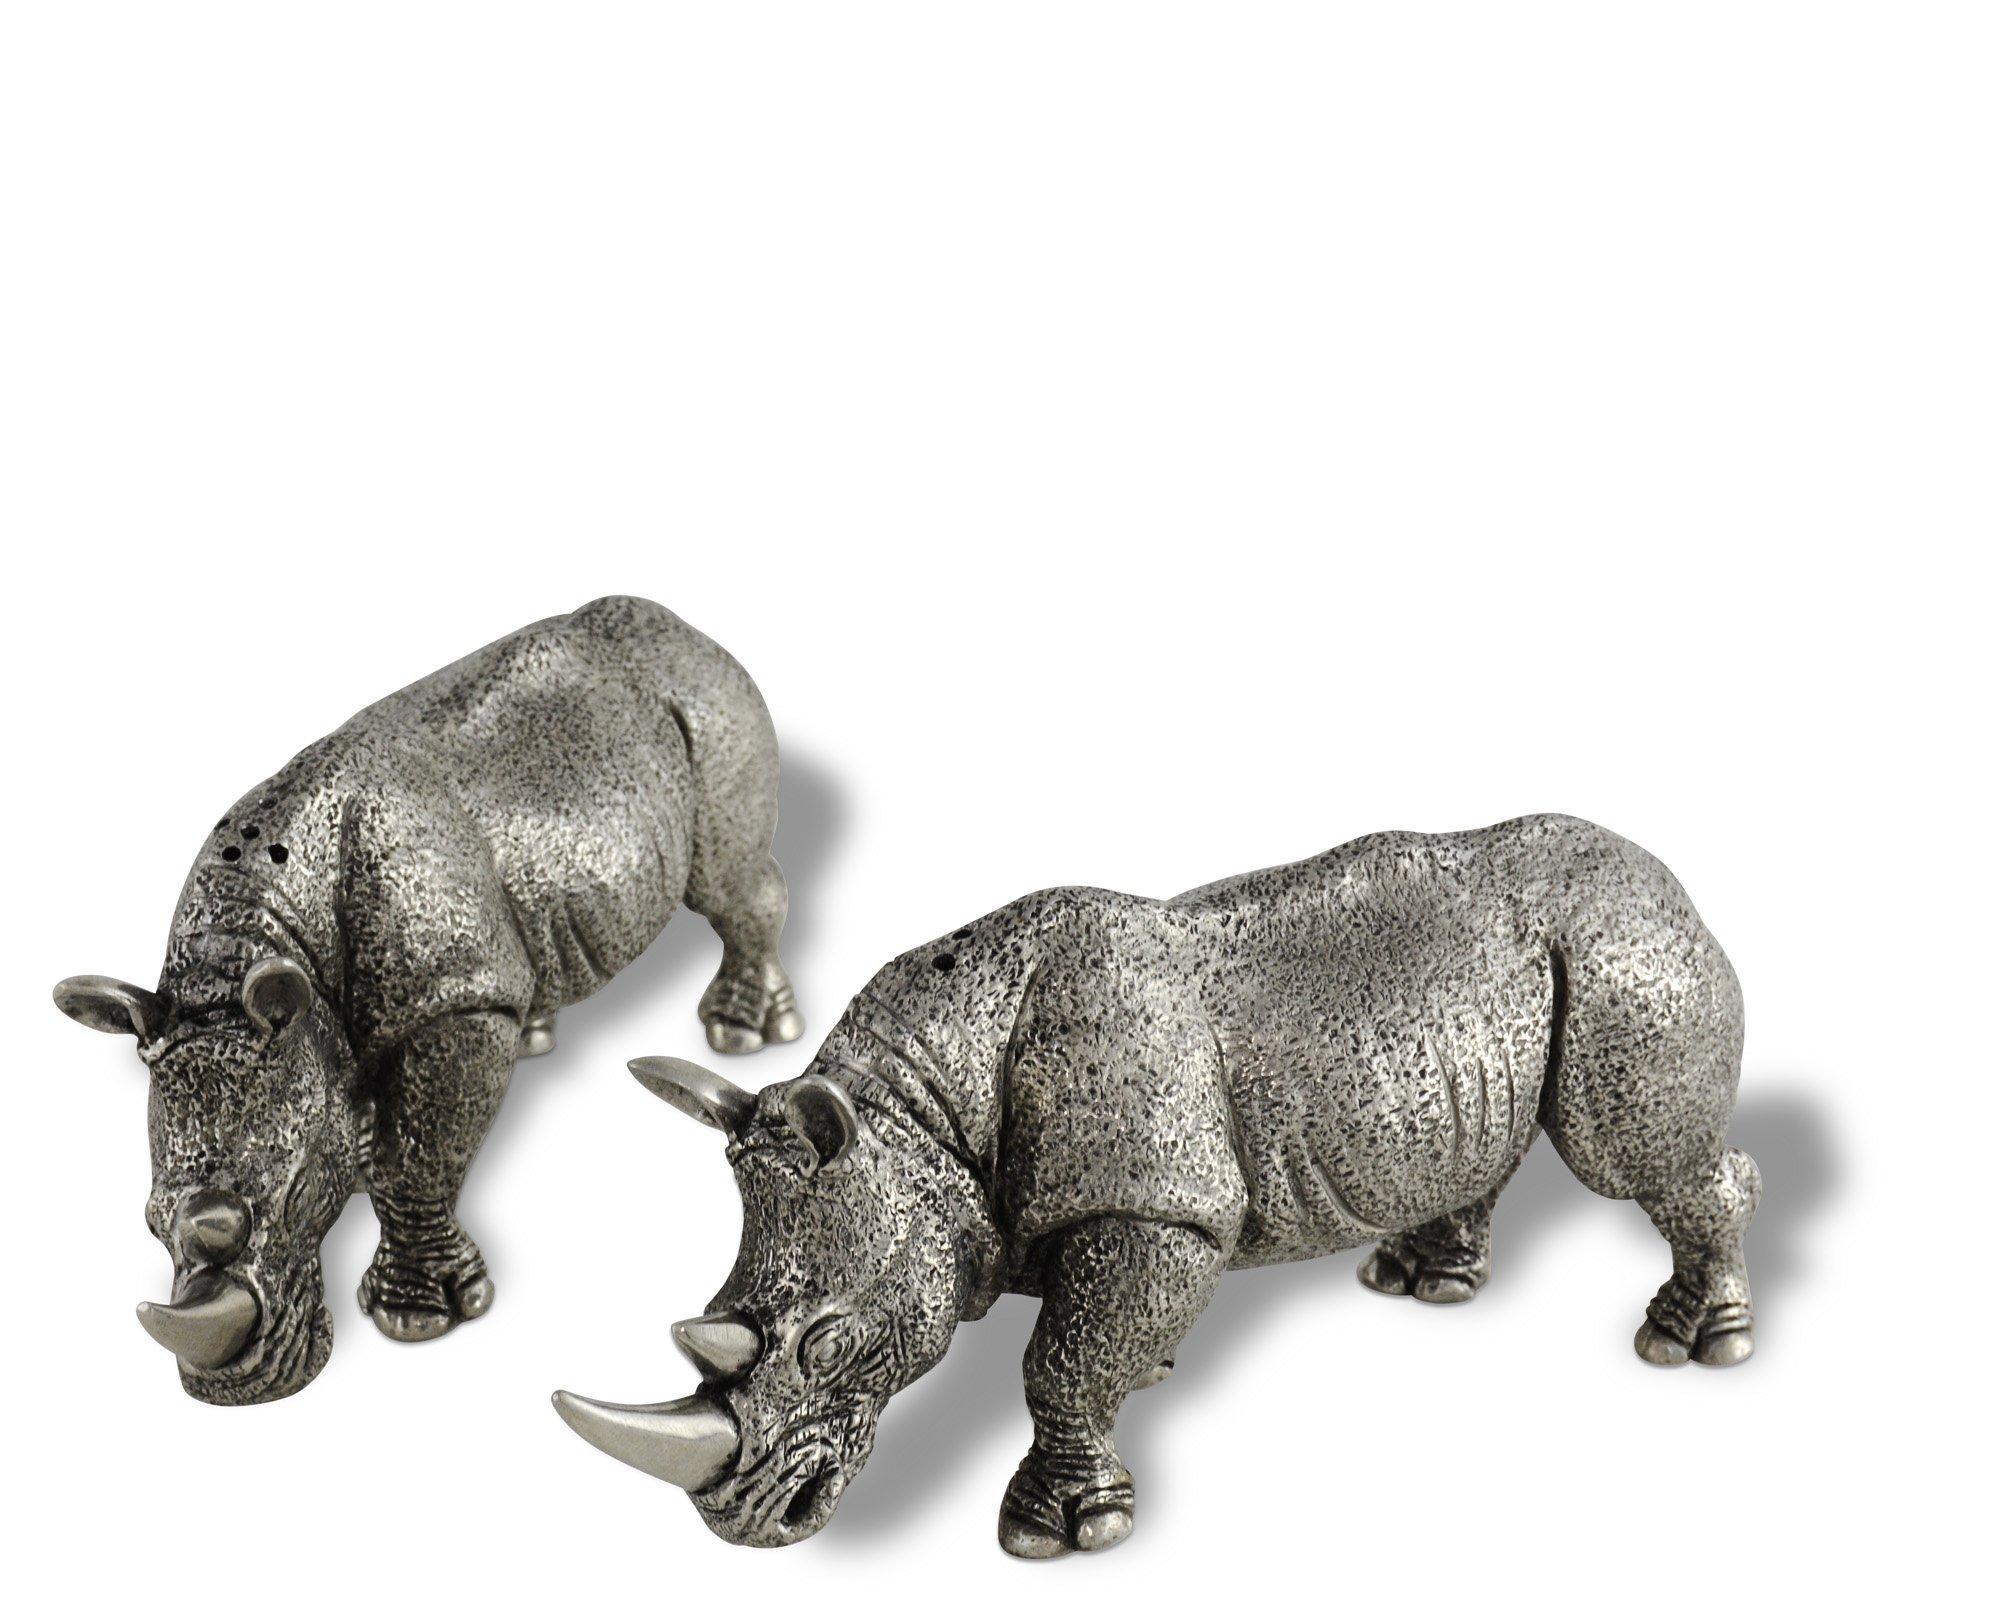 Vagabond House Pewter Rhinos Salt and Pepper Shaker Set 5.75'' Long x 2.5'' Tall